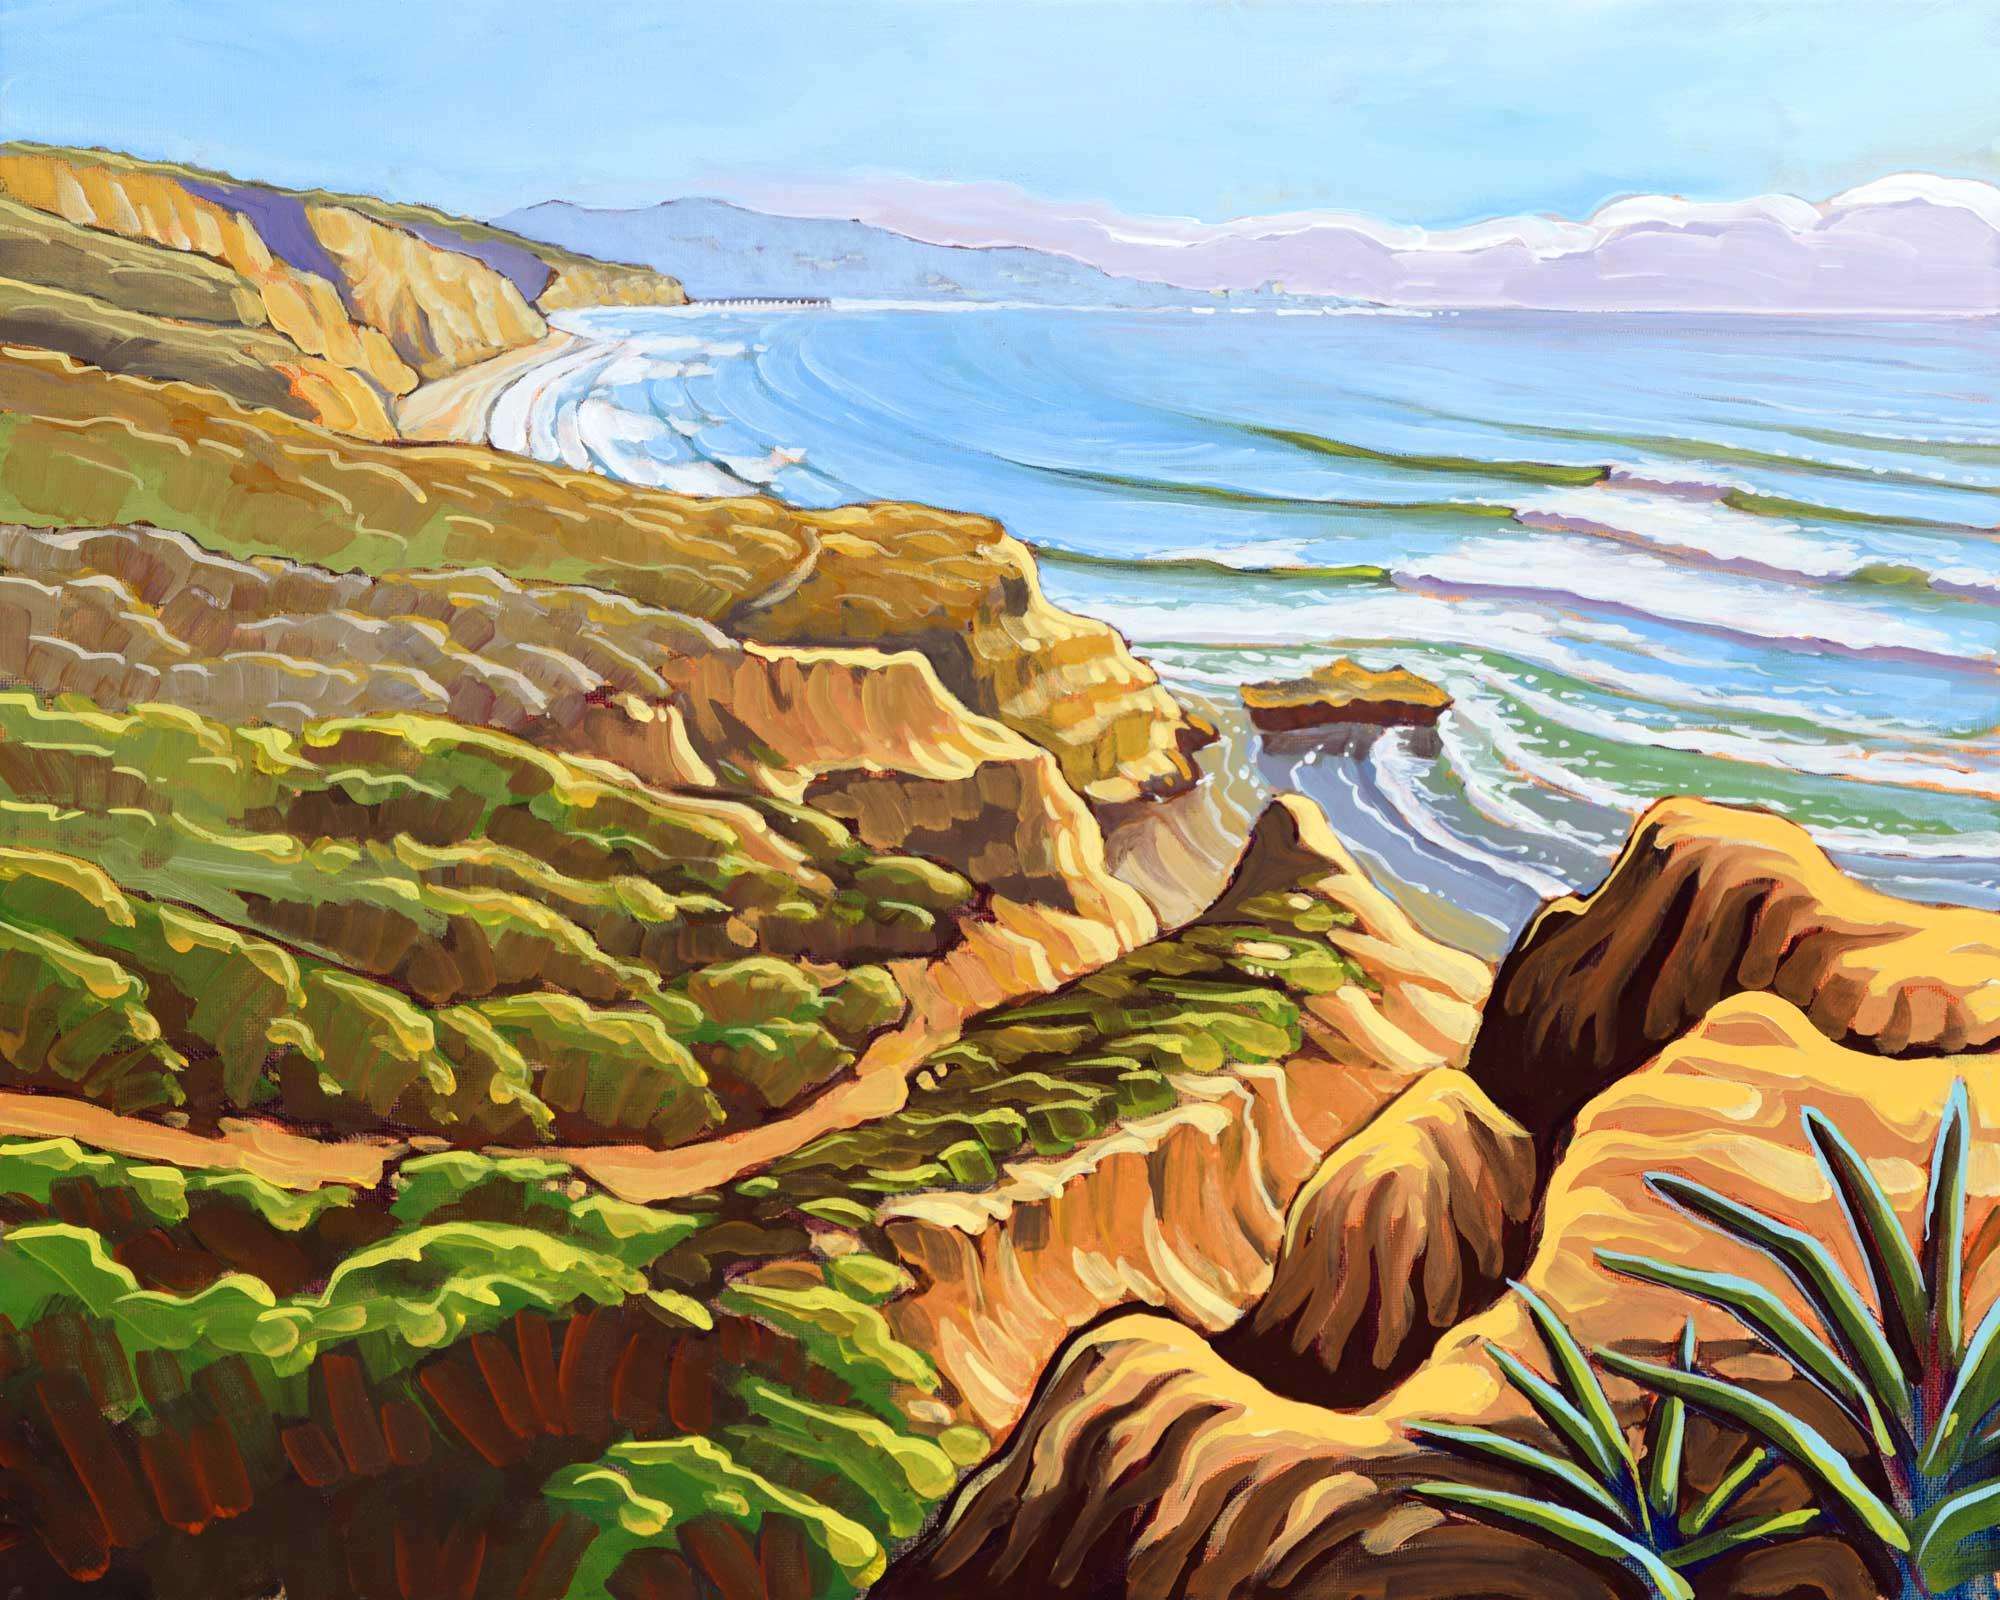 Plein air artwork from Torrey Pines State Park looking toward Black's Beach on the san diego coast of California